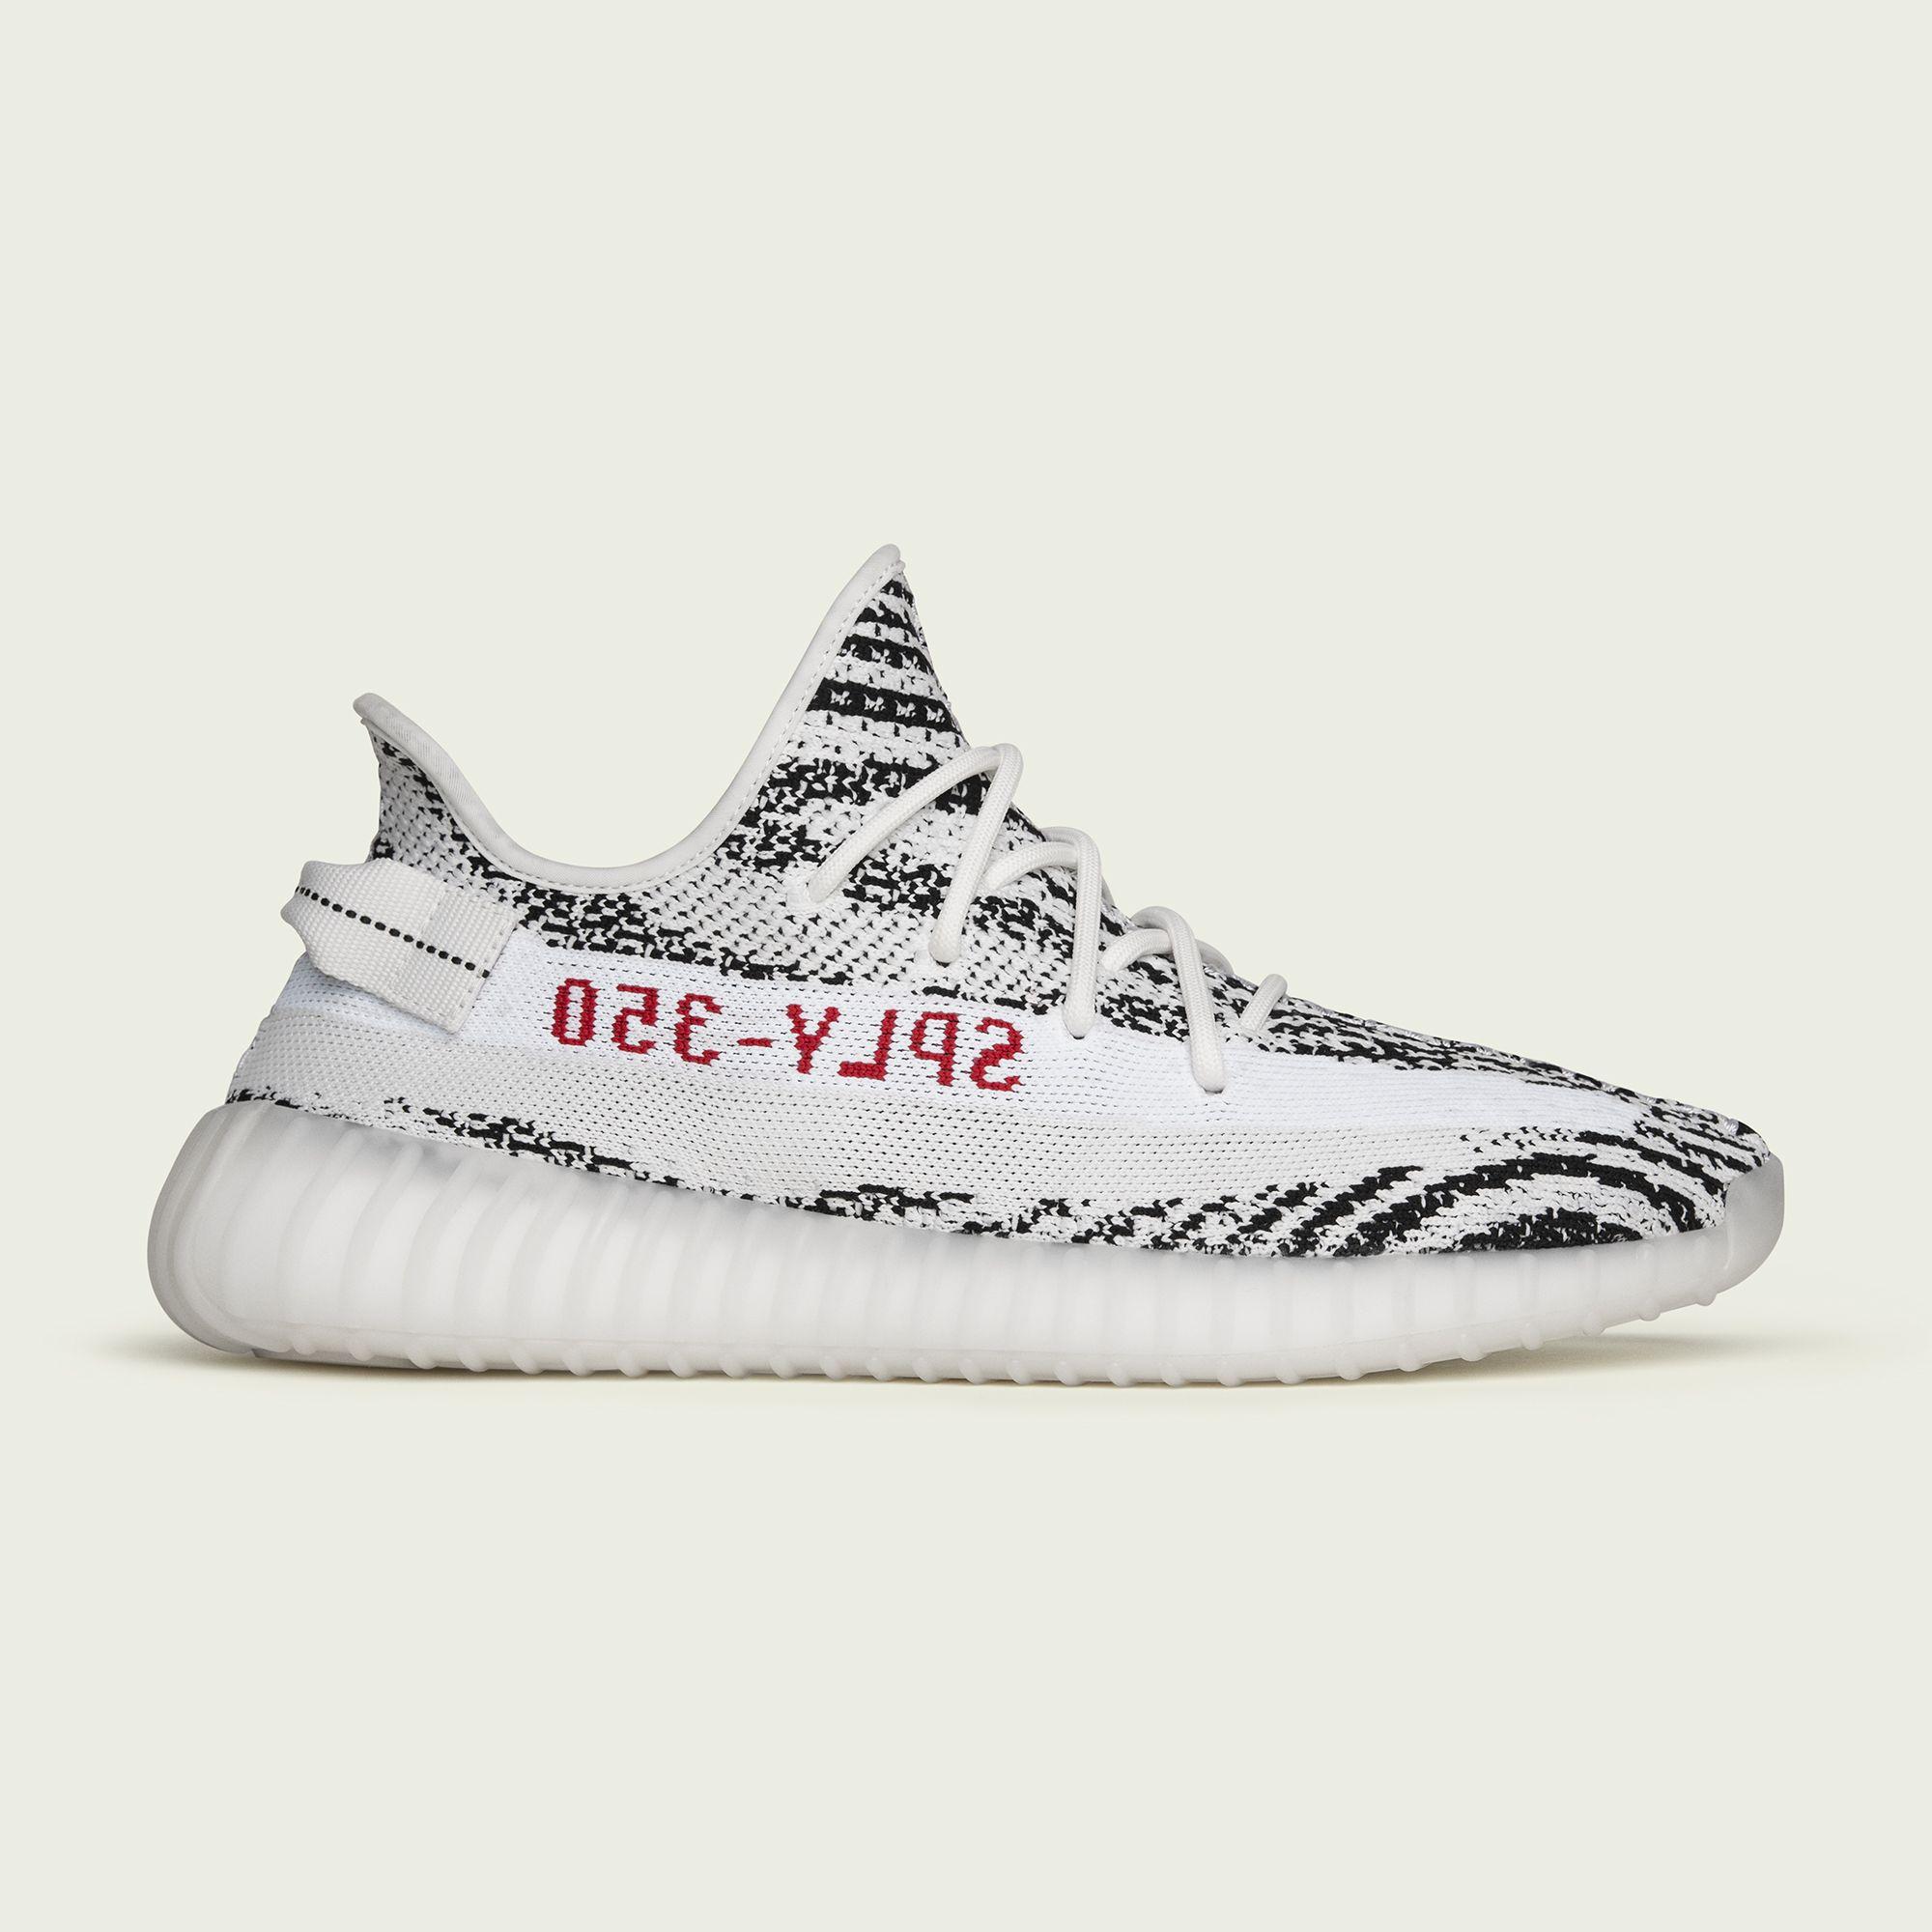 adidas Yeezy 350 V2 – Zebra   Sneakers mode, Yeezy schuhe